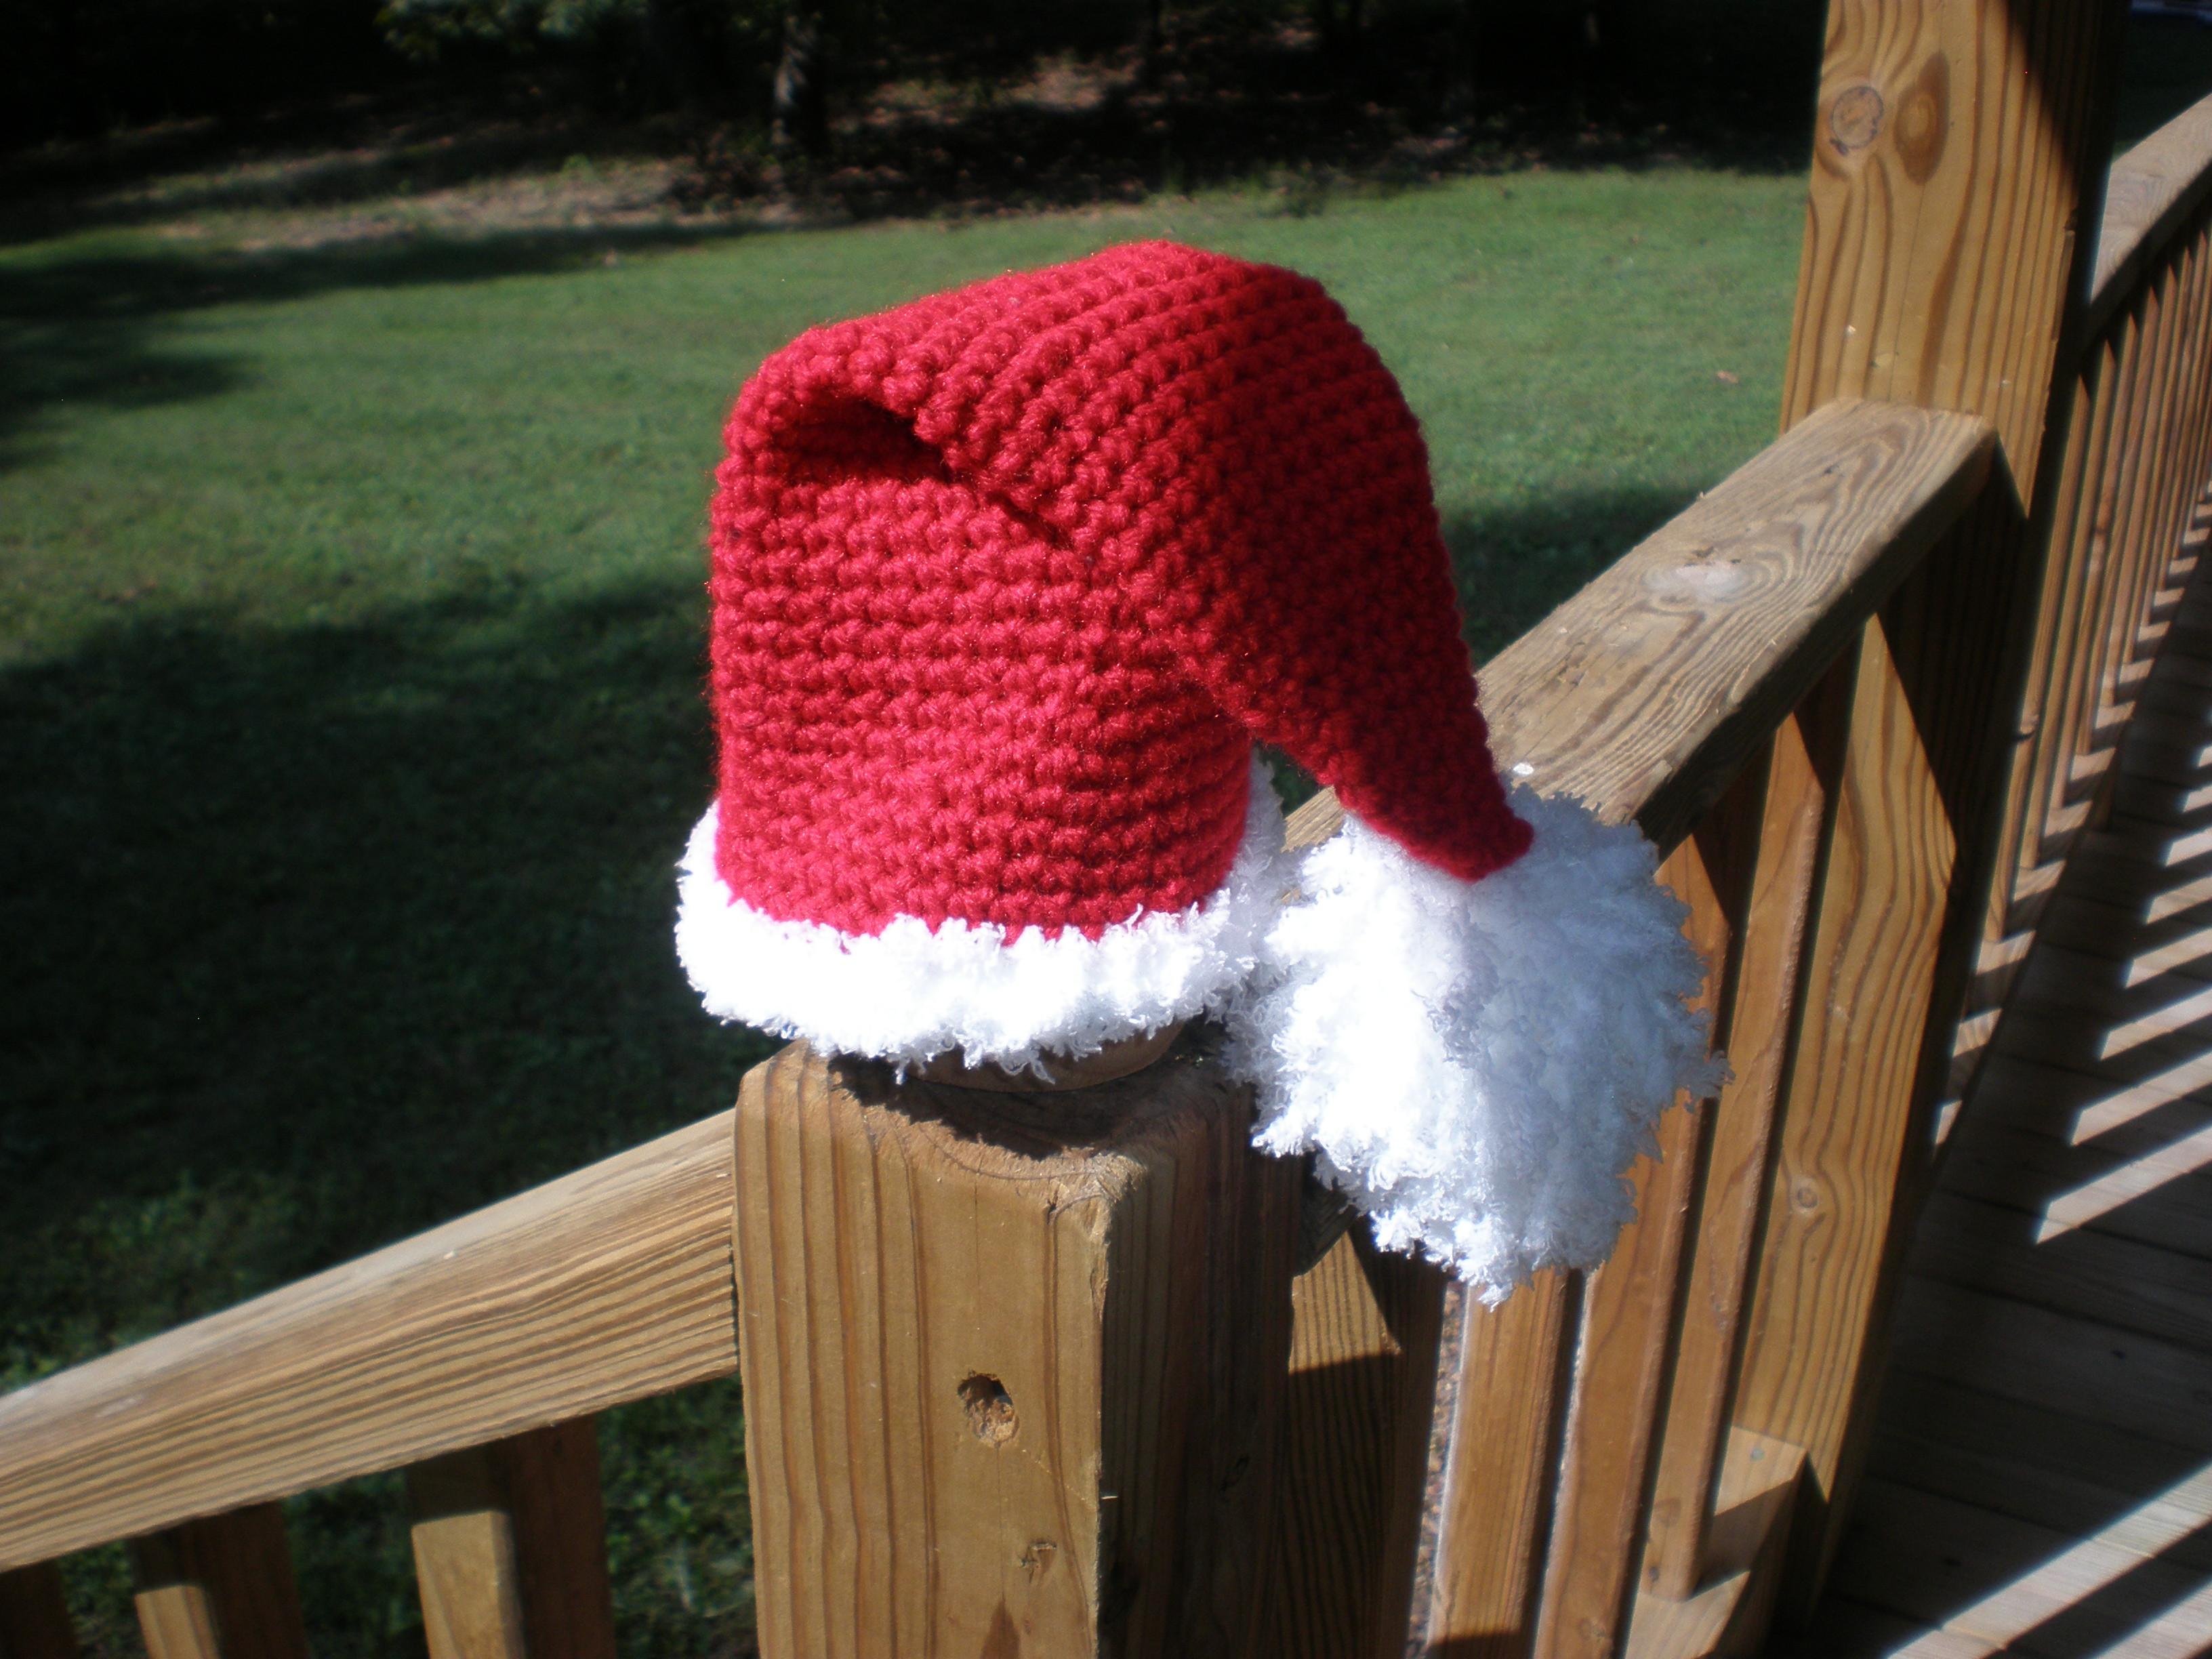 06c5e258b6f Crochet santa hat   diaper cover · CuteNCuddly Crochet · Online ...